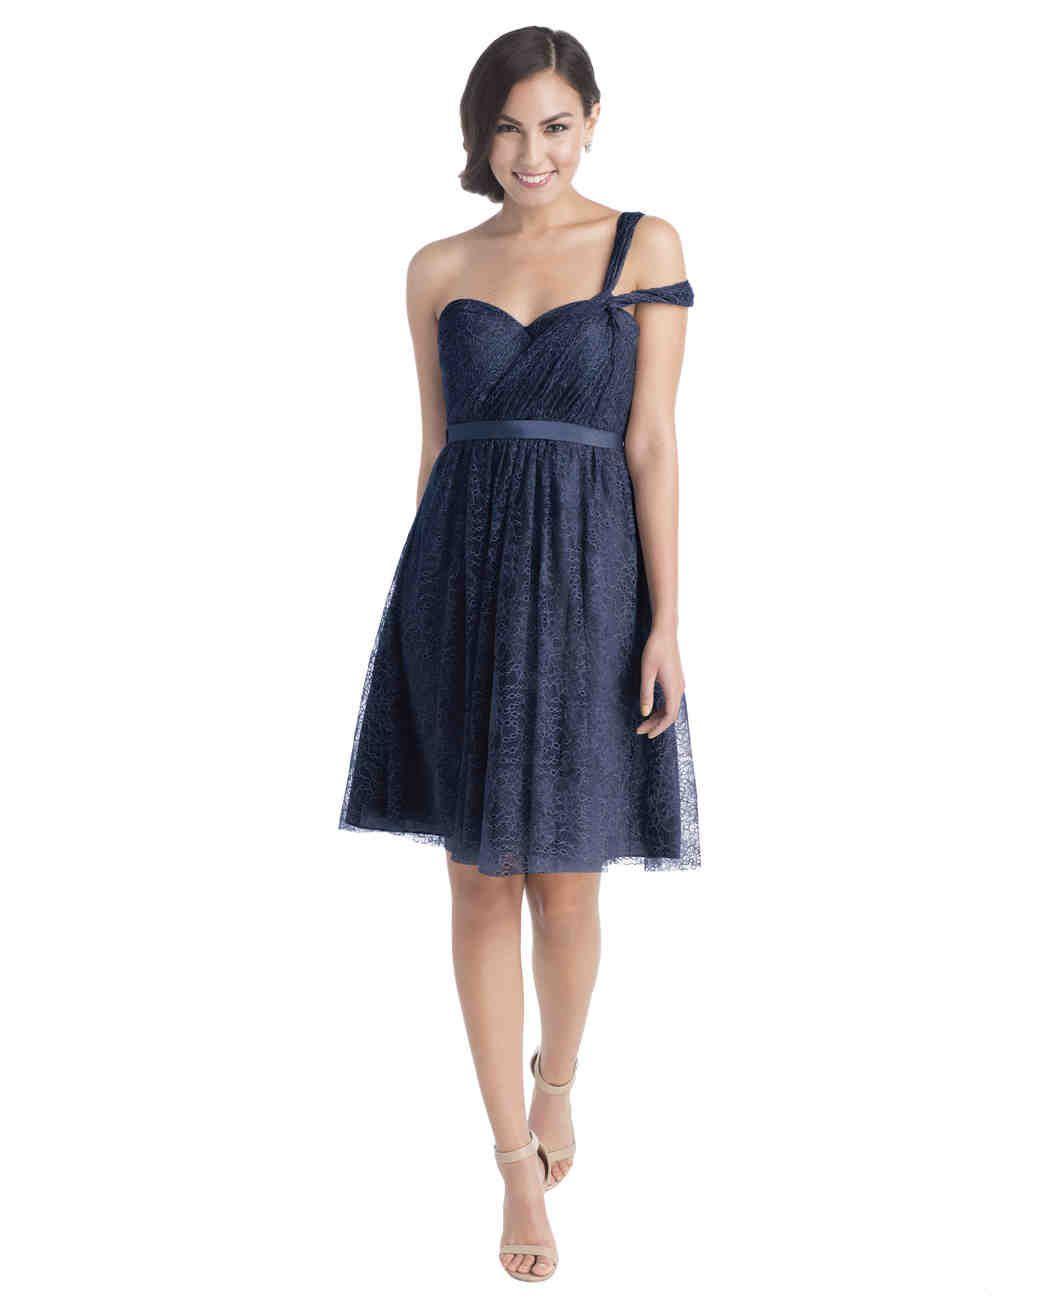 Wedding dresses rental  Rent Dress for Wedding Guest  Best Shapewear for Wedding Dress